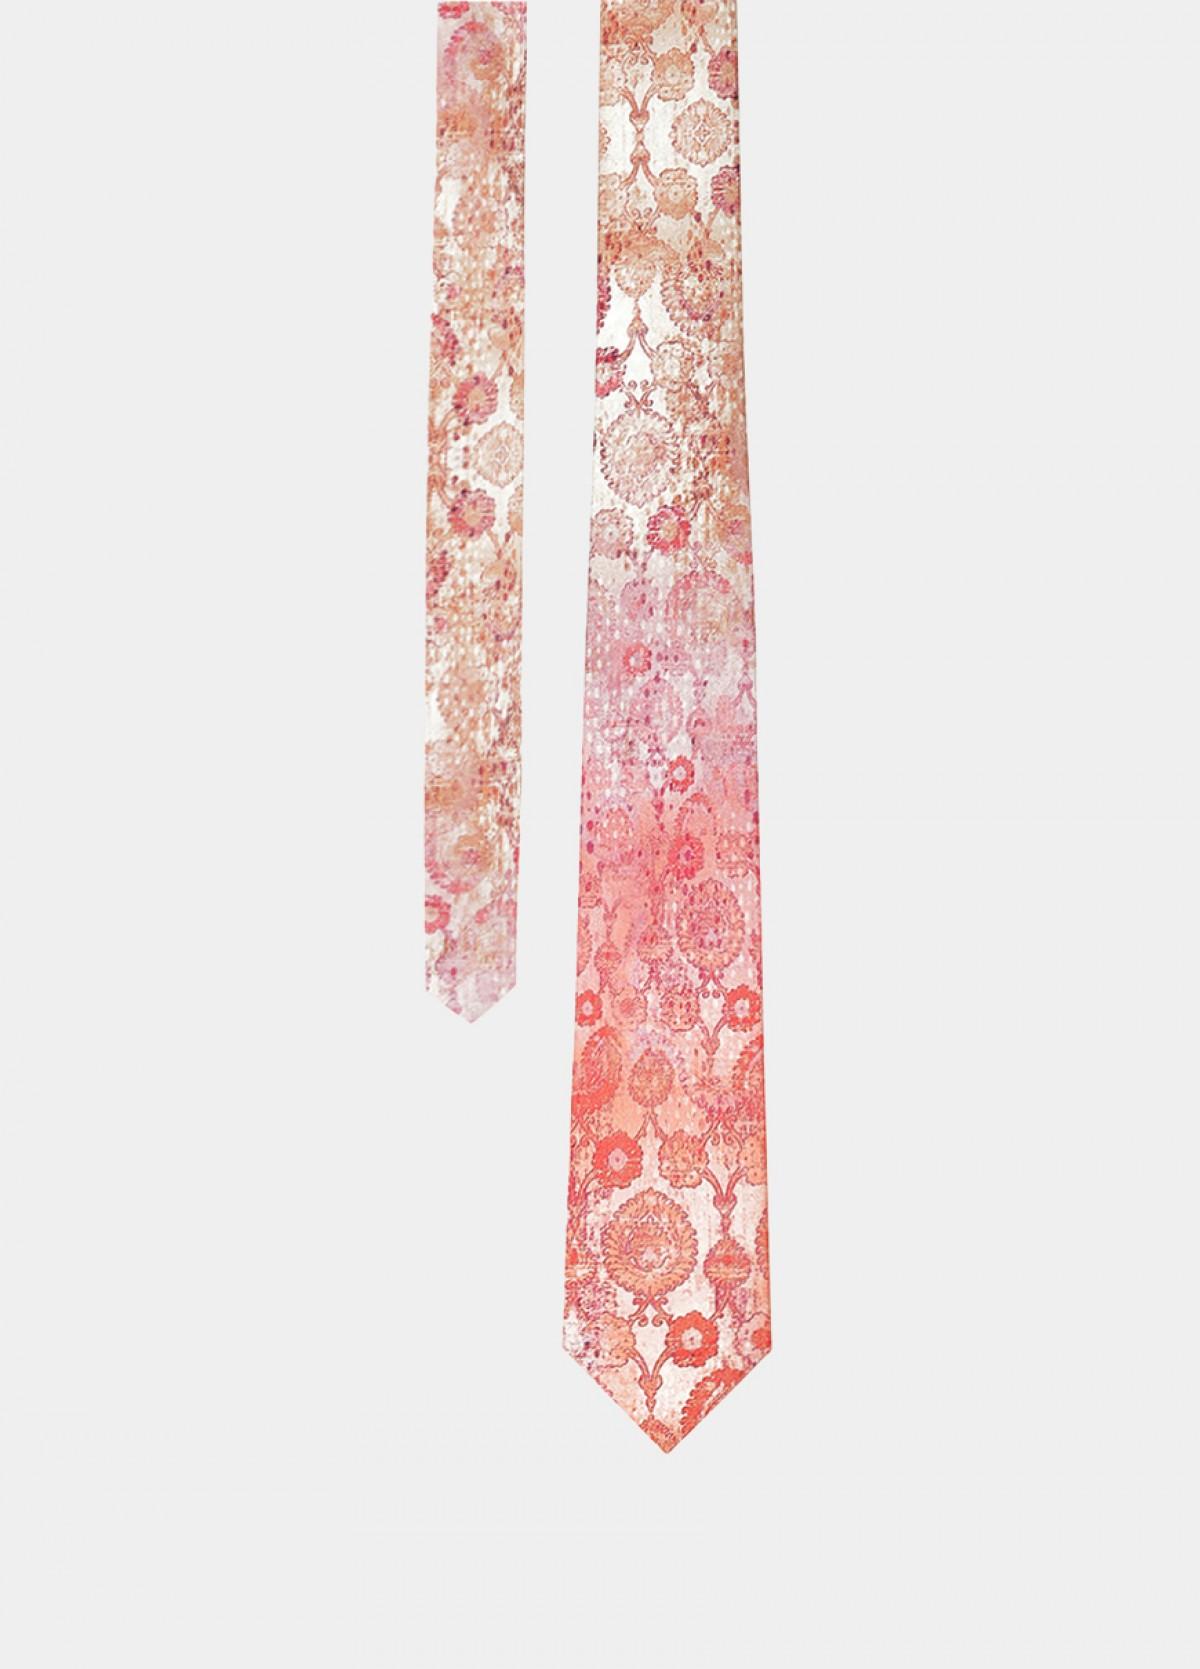 The Peach Printed Silk Tie